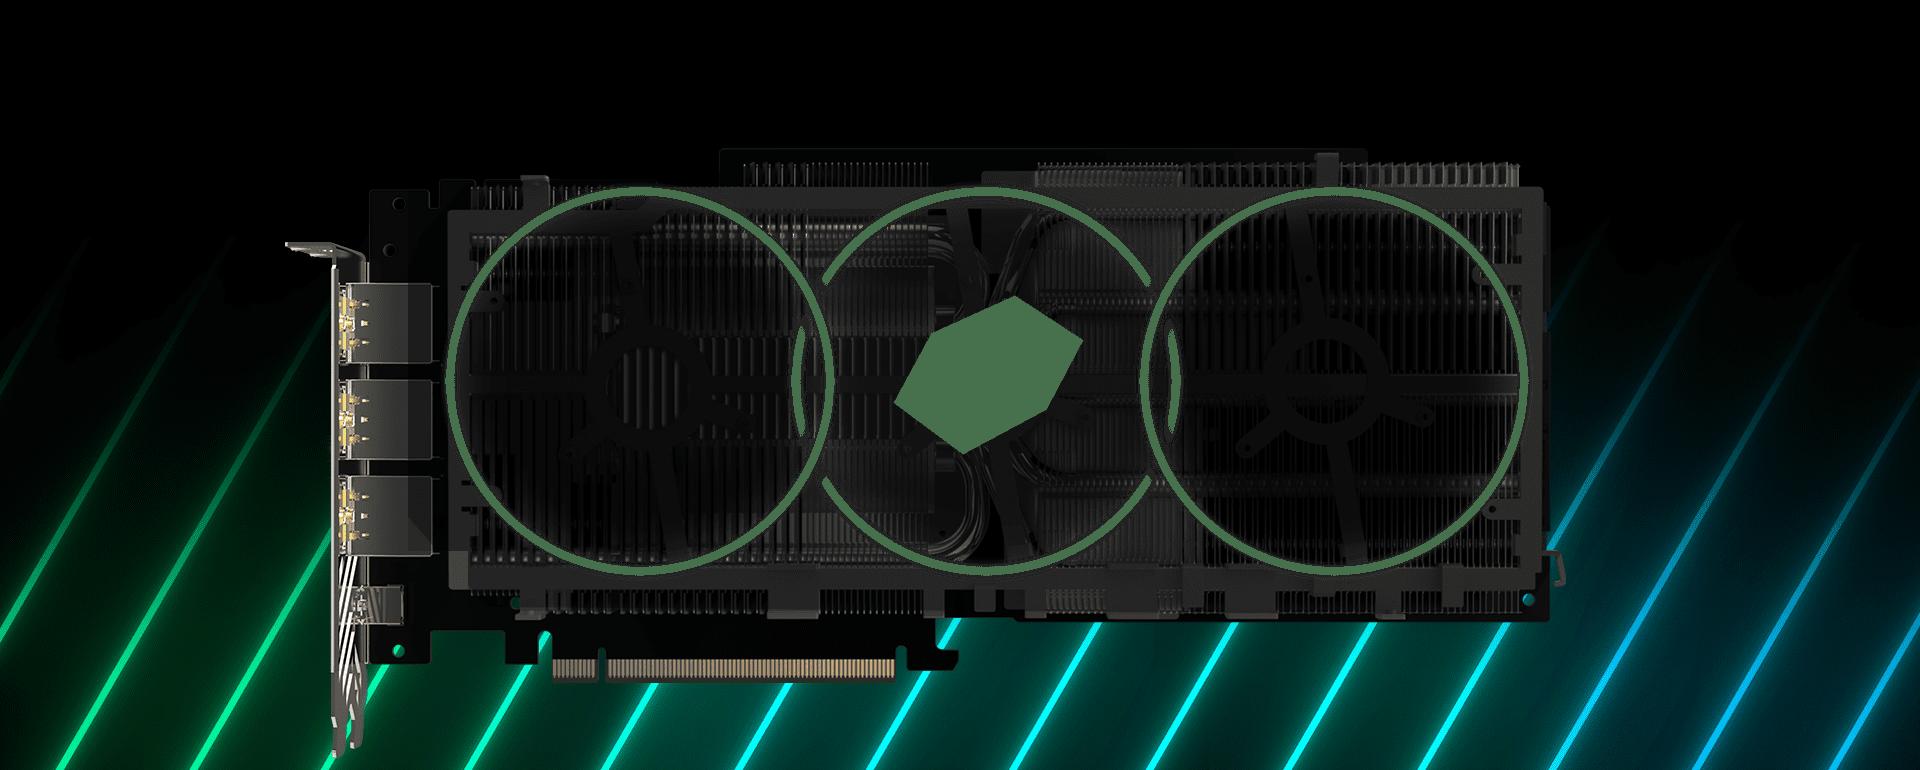 AORUS GeForce RTX™ 2080 XTREME 8G | Graphics Card - GIGABYTE Global